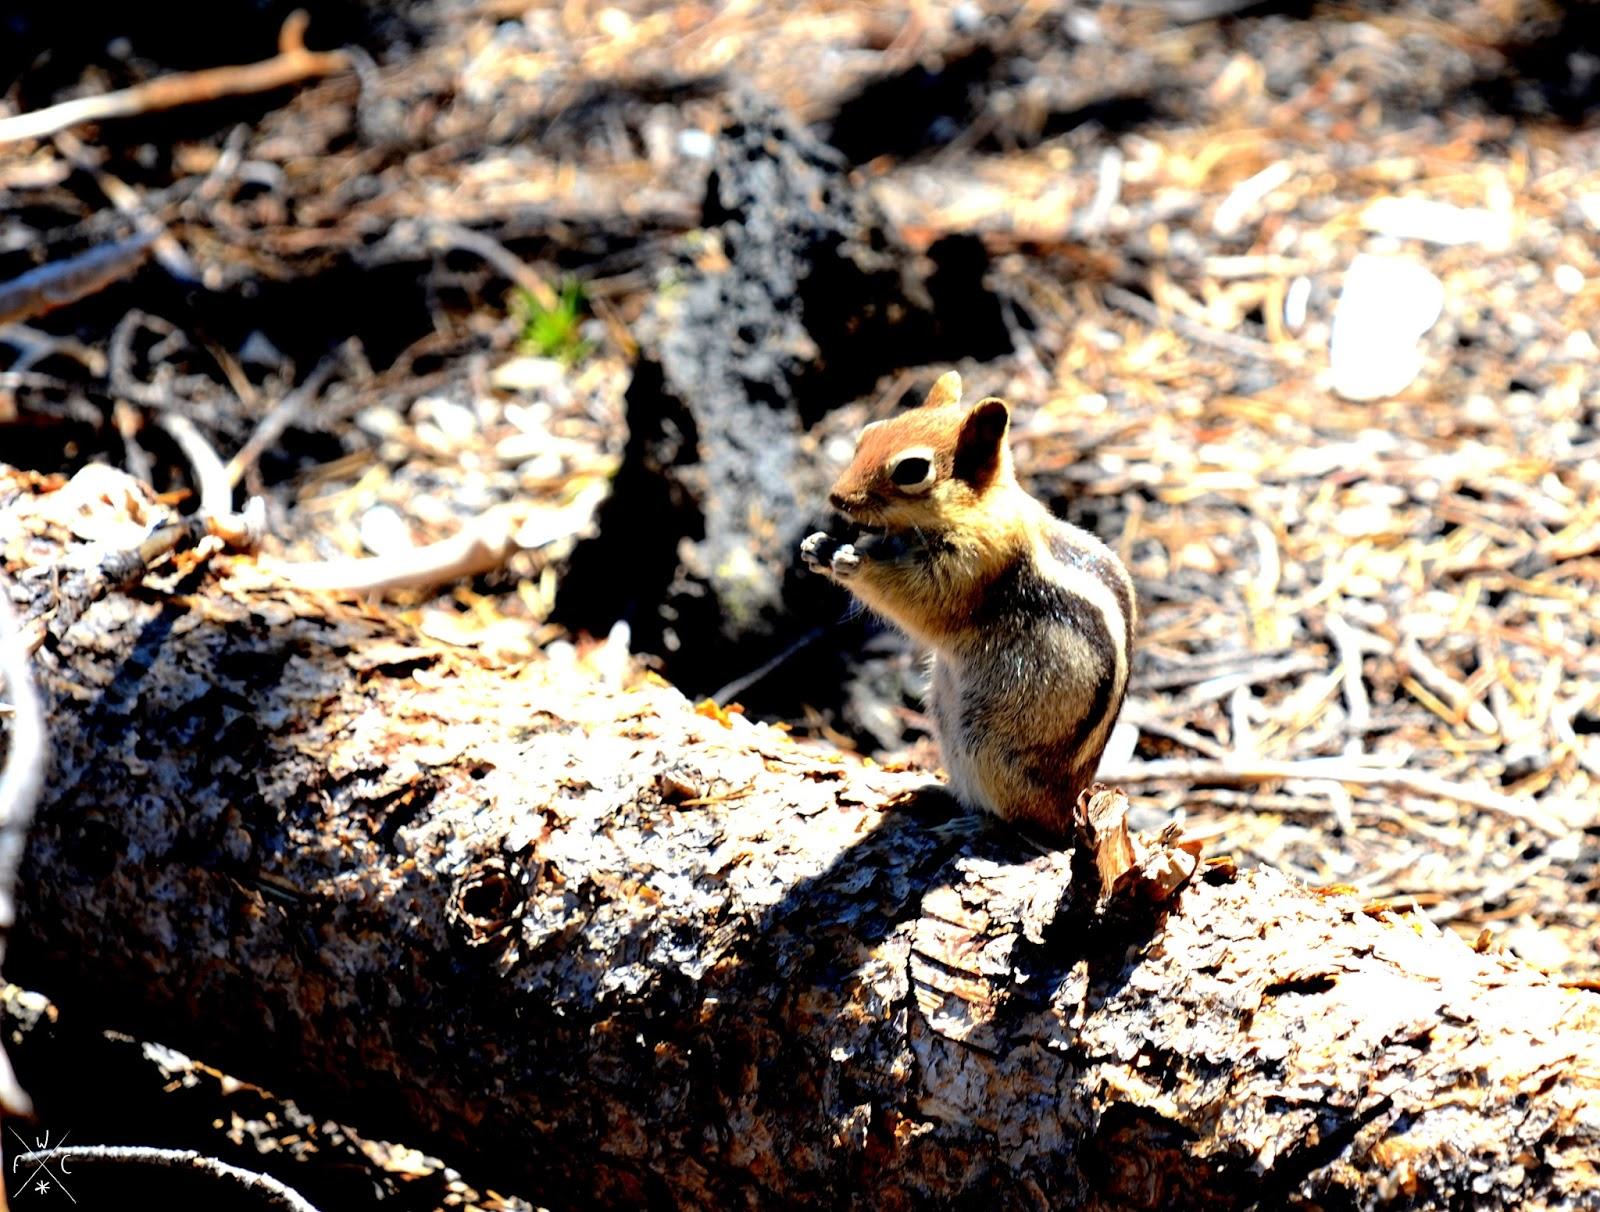 Chipmunk, Deschutes National Forest, Oregon, USA